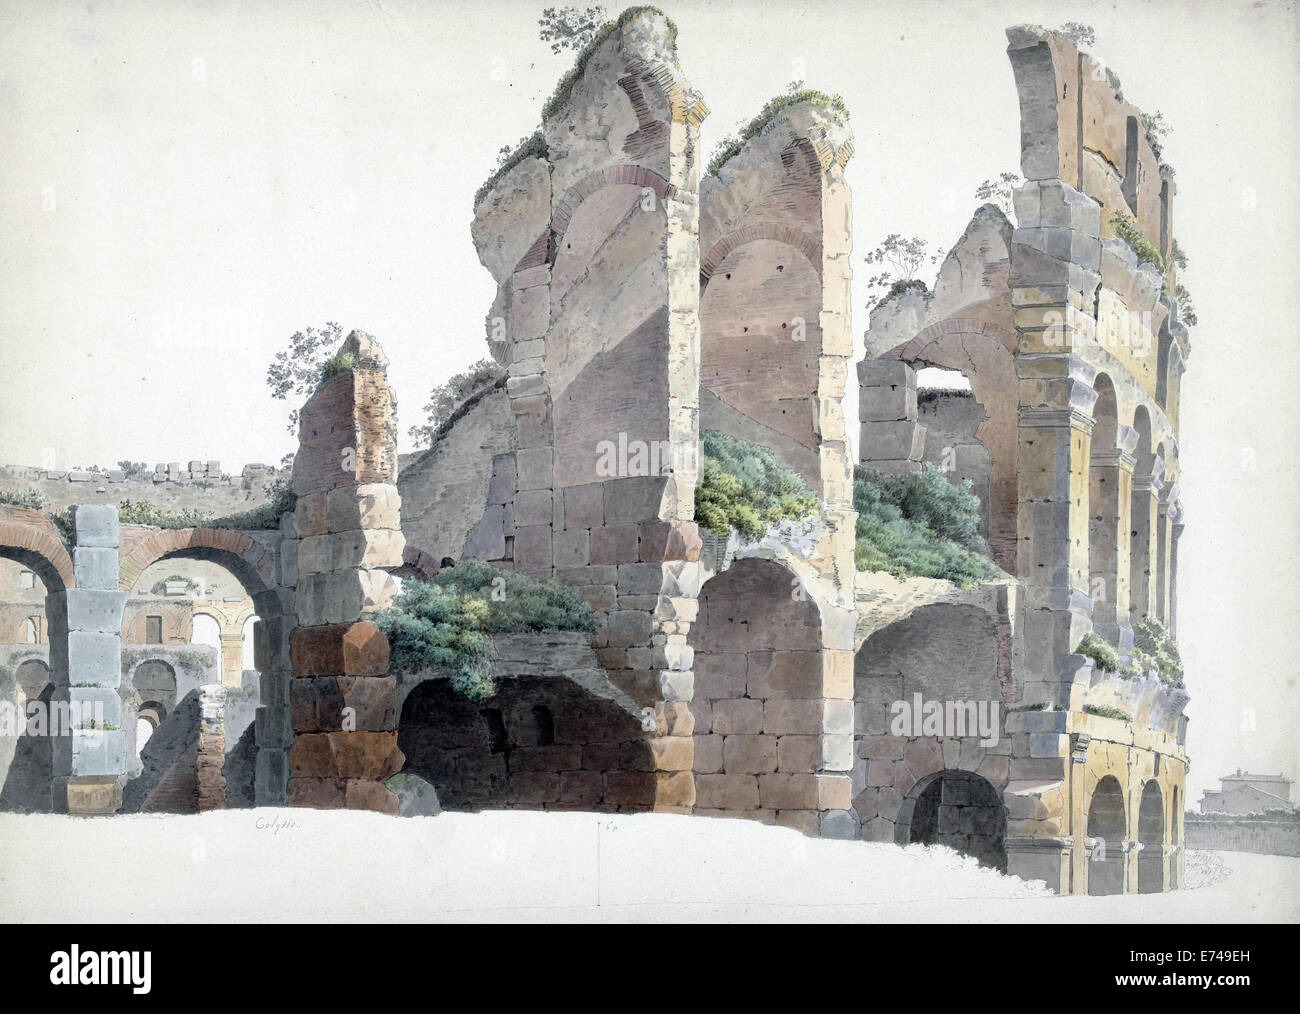 The Colosseum in Rome - by Josephus Augustus Knip, 1809 Stock Photo